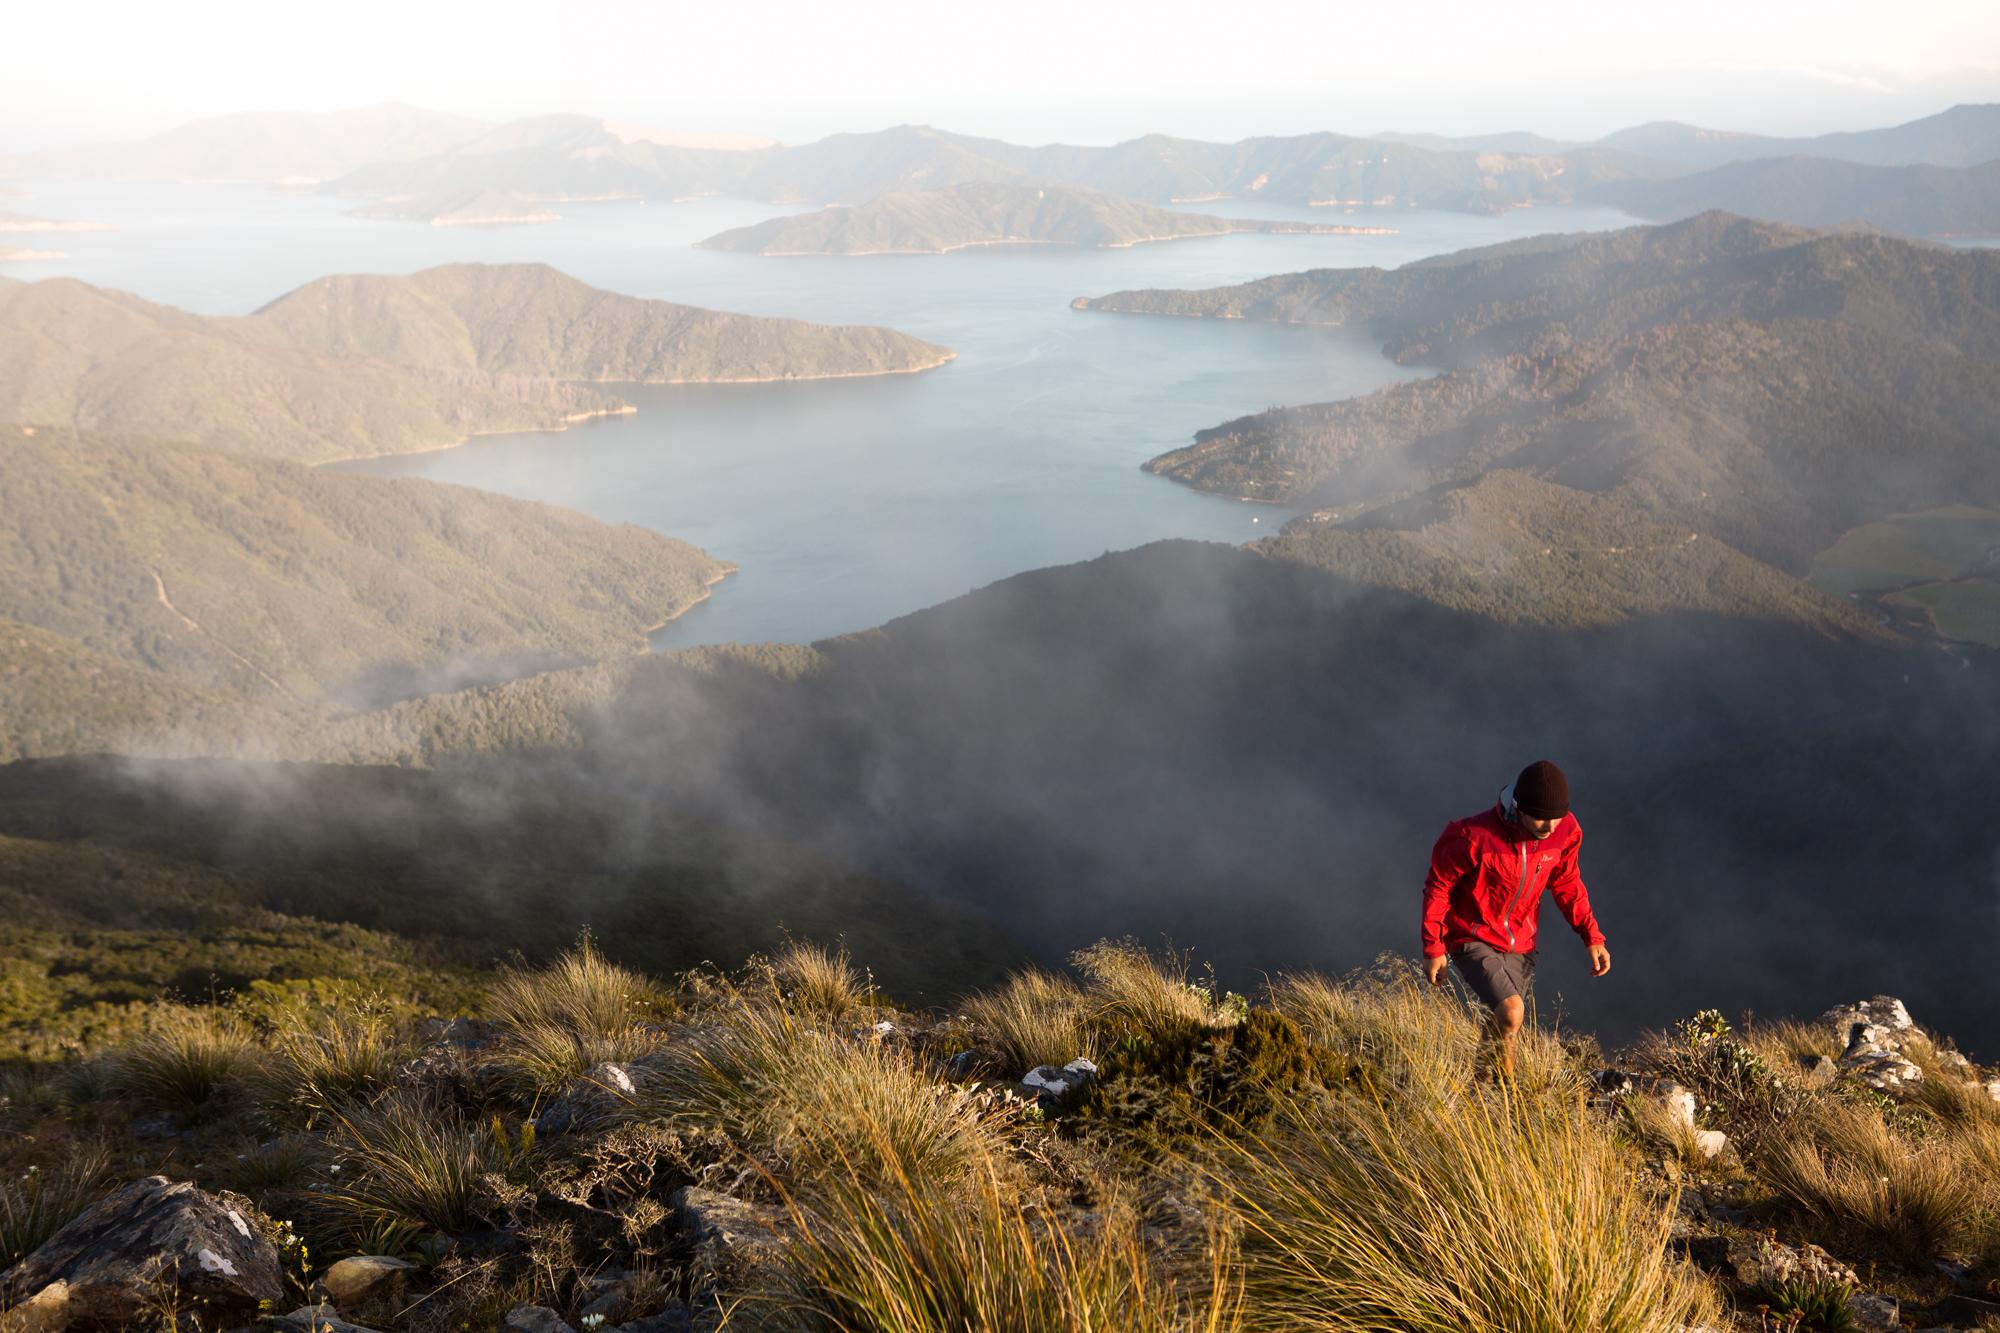 7-Bec_Kilpatrick_Photography_New_ZealandXXX_6384